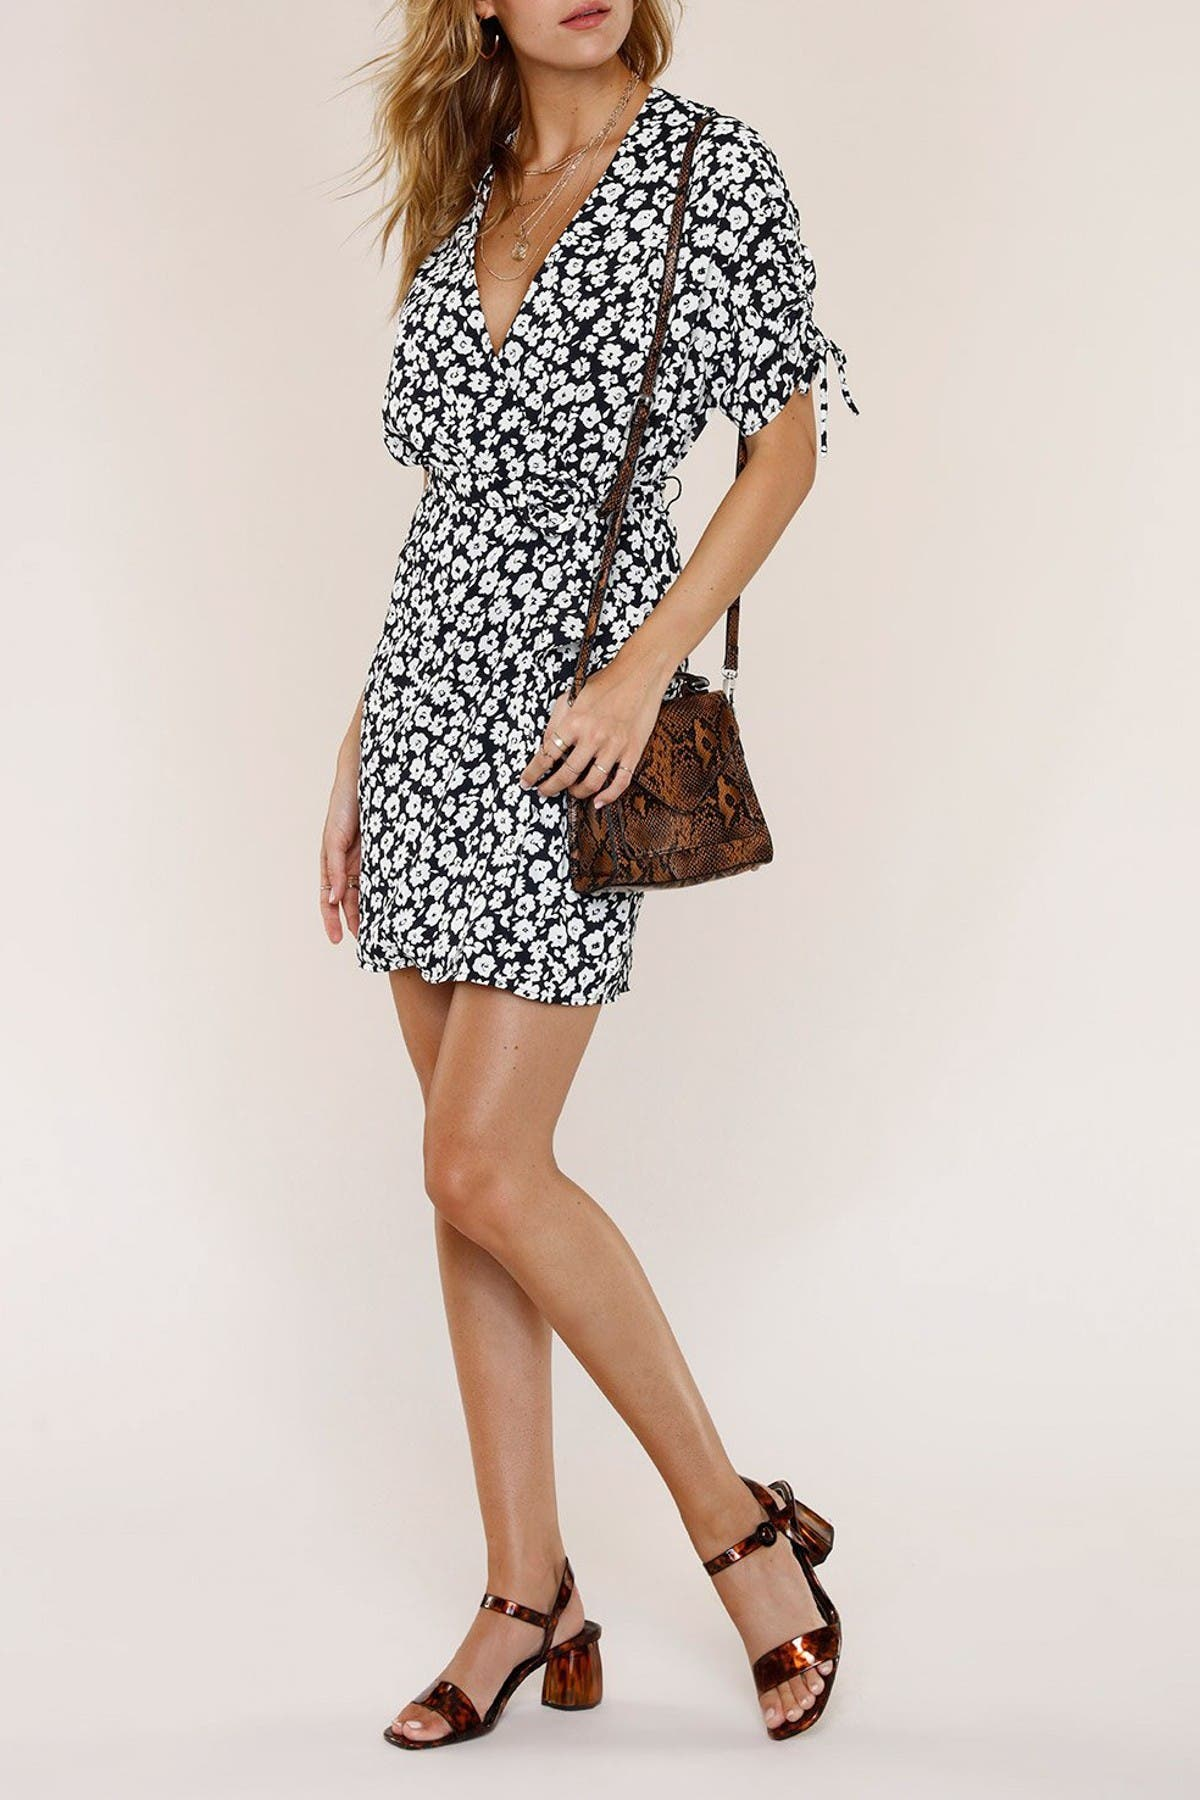 Image of Heartloom Nova Floral Wrap Mini Dress